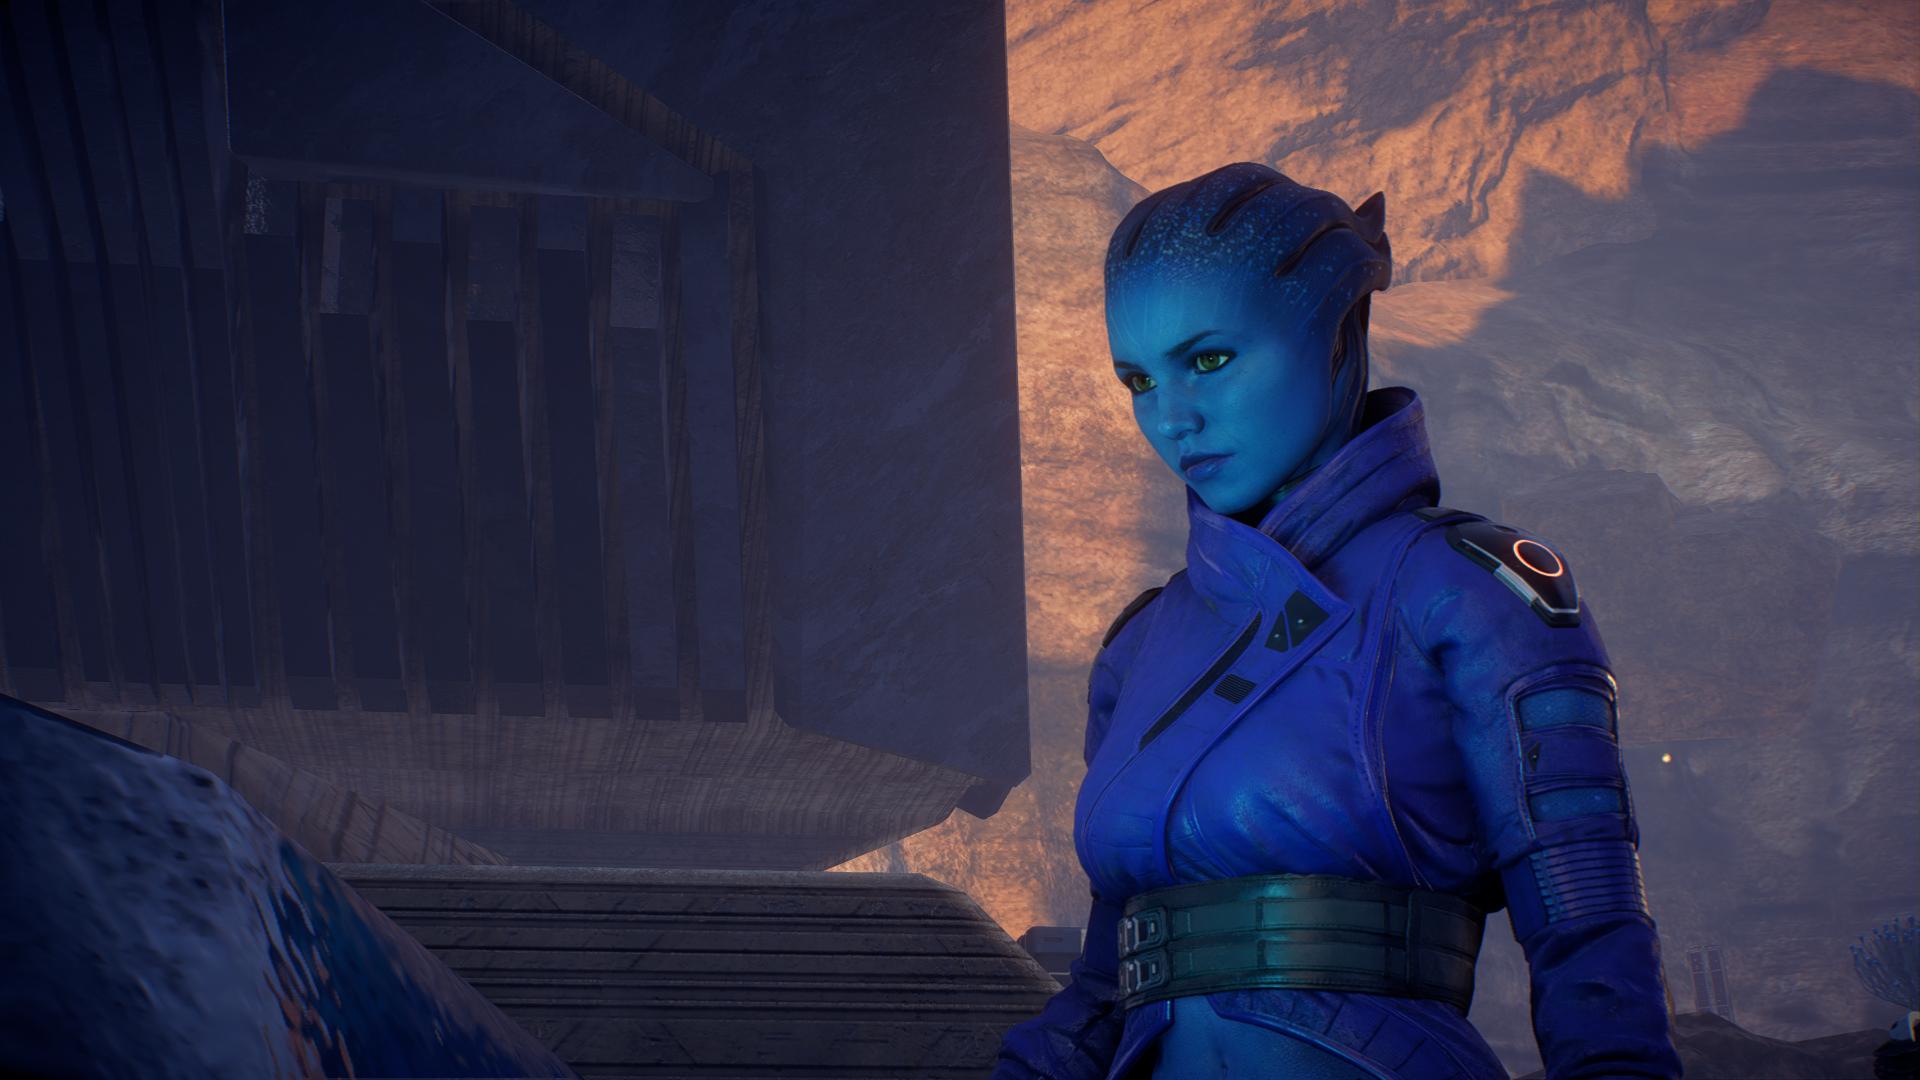 291-4-1497435208.jpg - Mass Effect: Andromeda